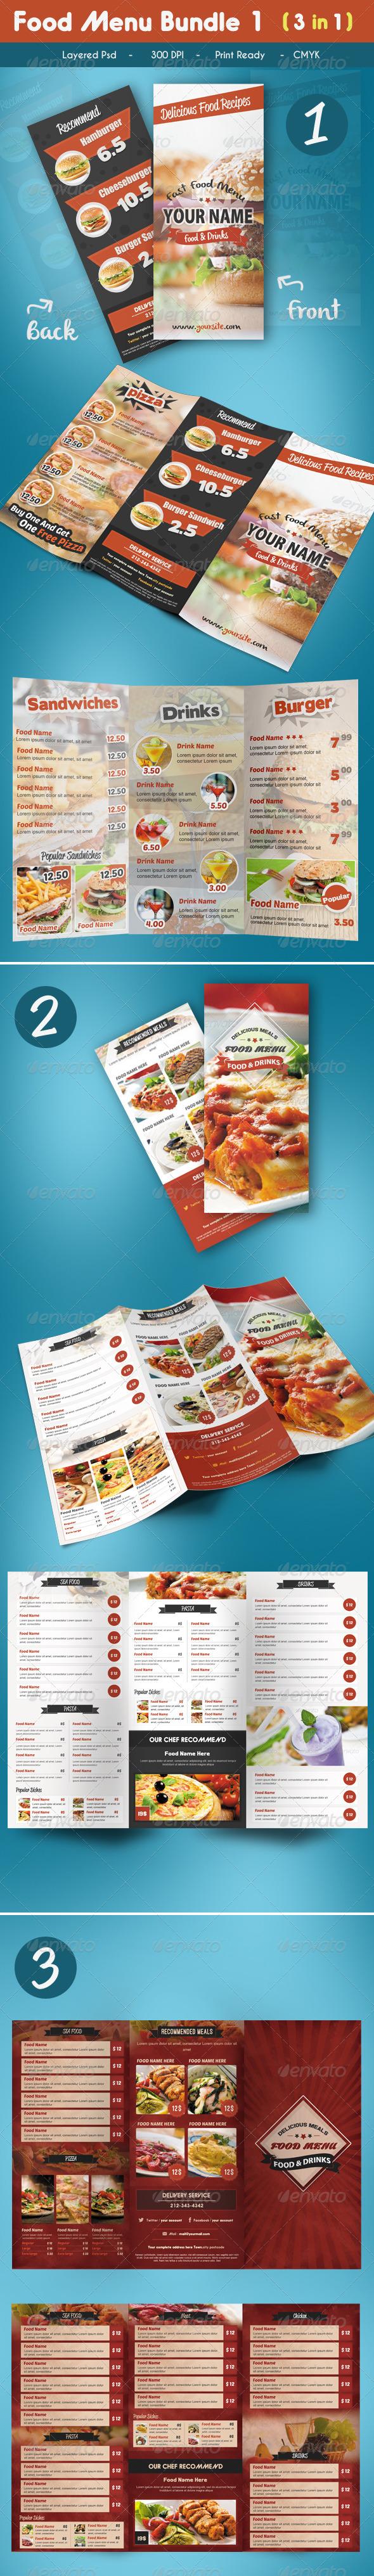 Trifold Food Menu Bundle_1